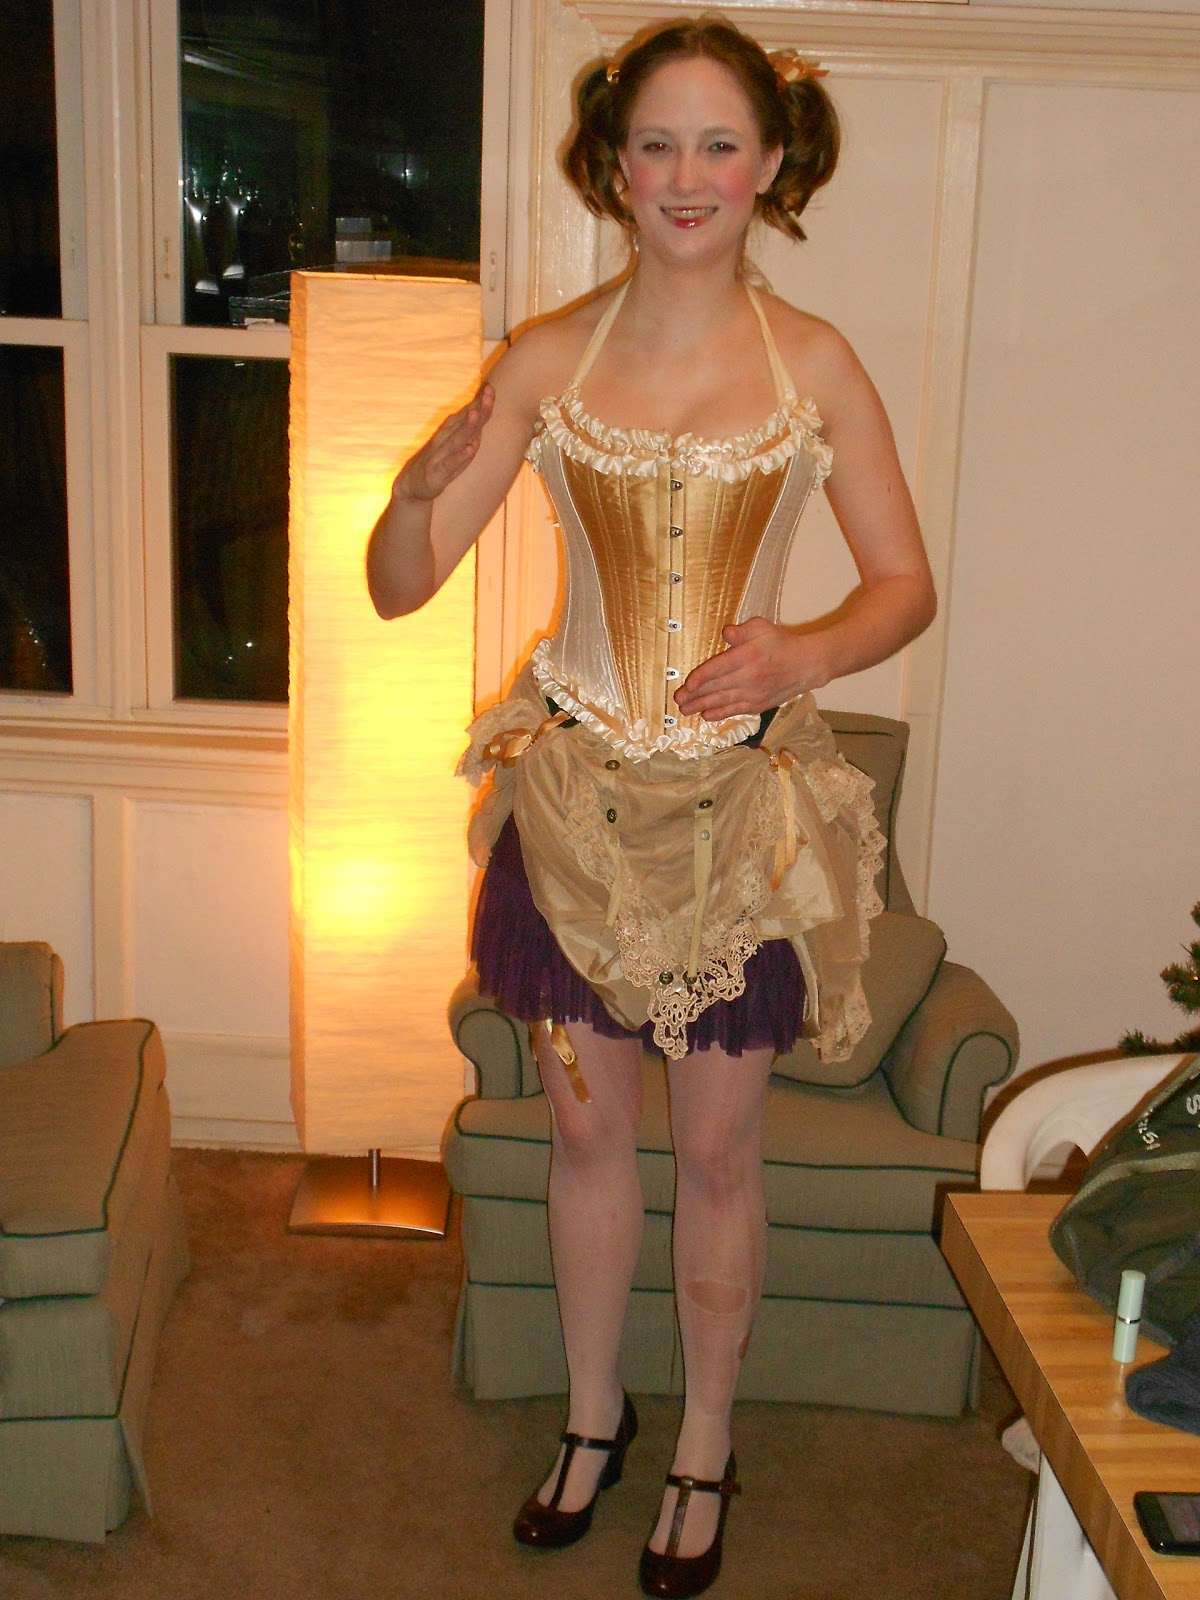 Face free sex pics victorian costume big breast